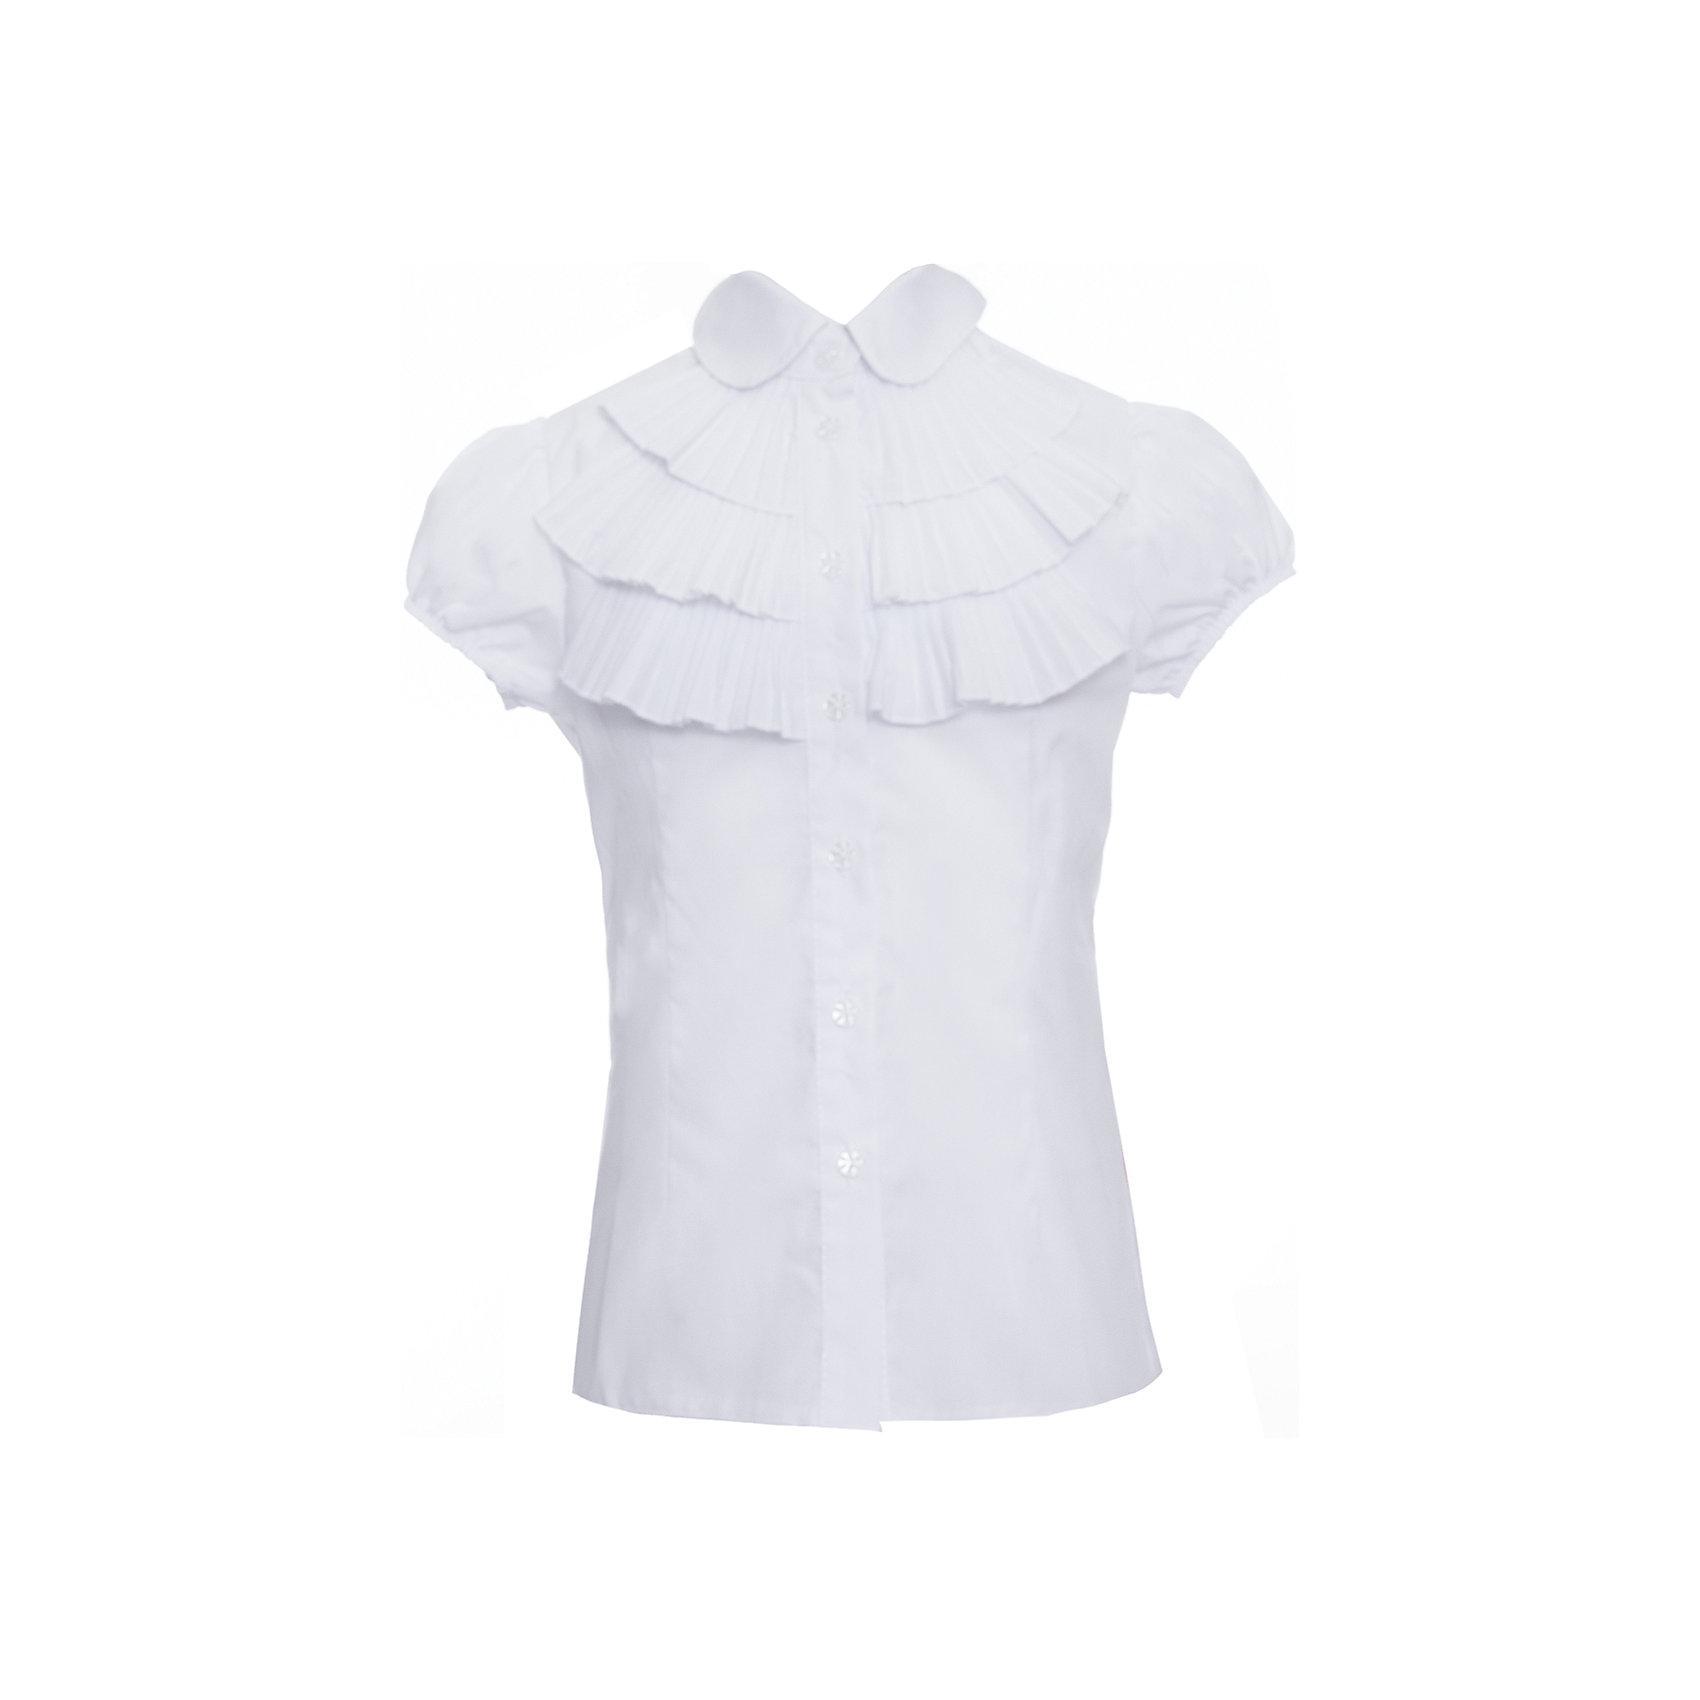 Skylake Блузка для девочки Лена Skylake skylake юбка для девочки агат skylake